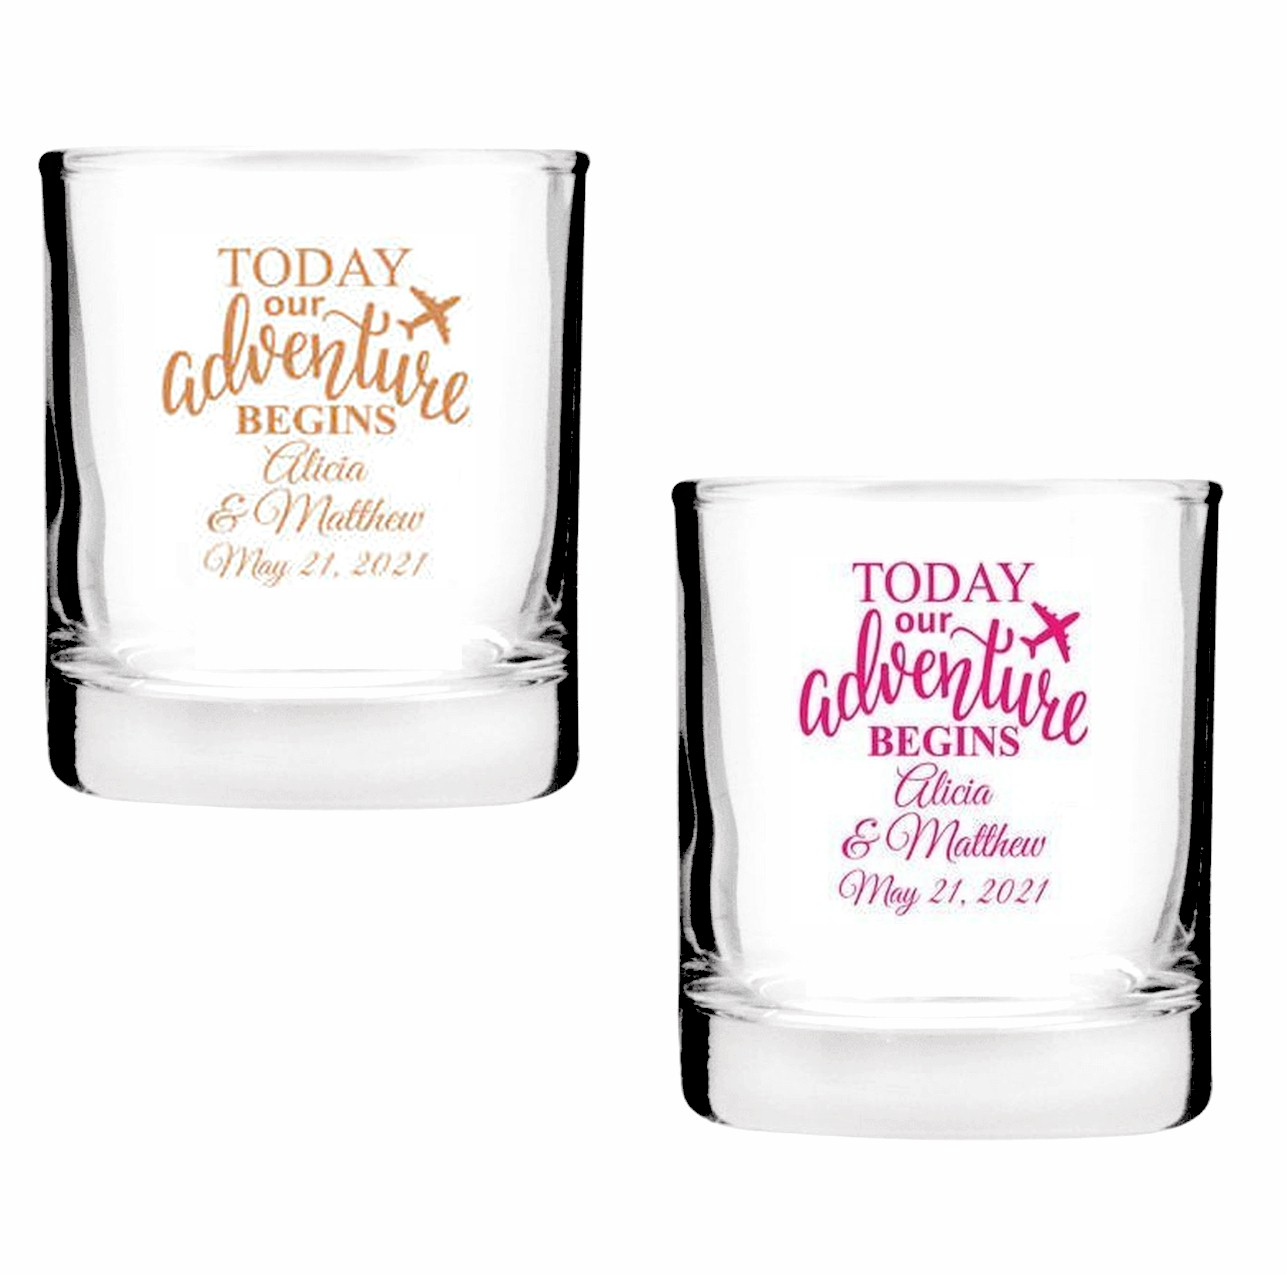 Mountain Shot Glasses Mountain Wedding Favors 1651 Shot Glasses Colorado Shot Glass Mountain Shot Glass Rustic Party Housewarming